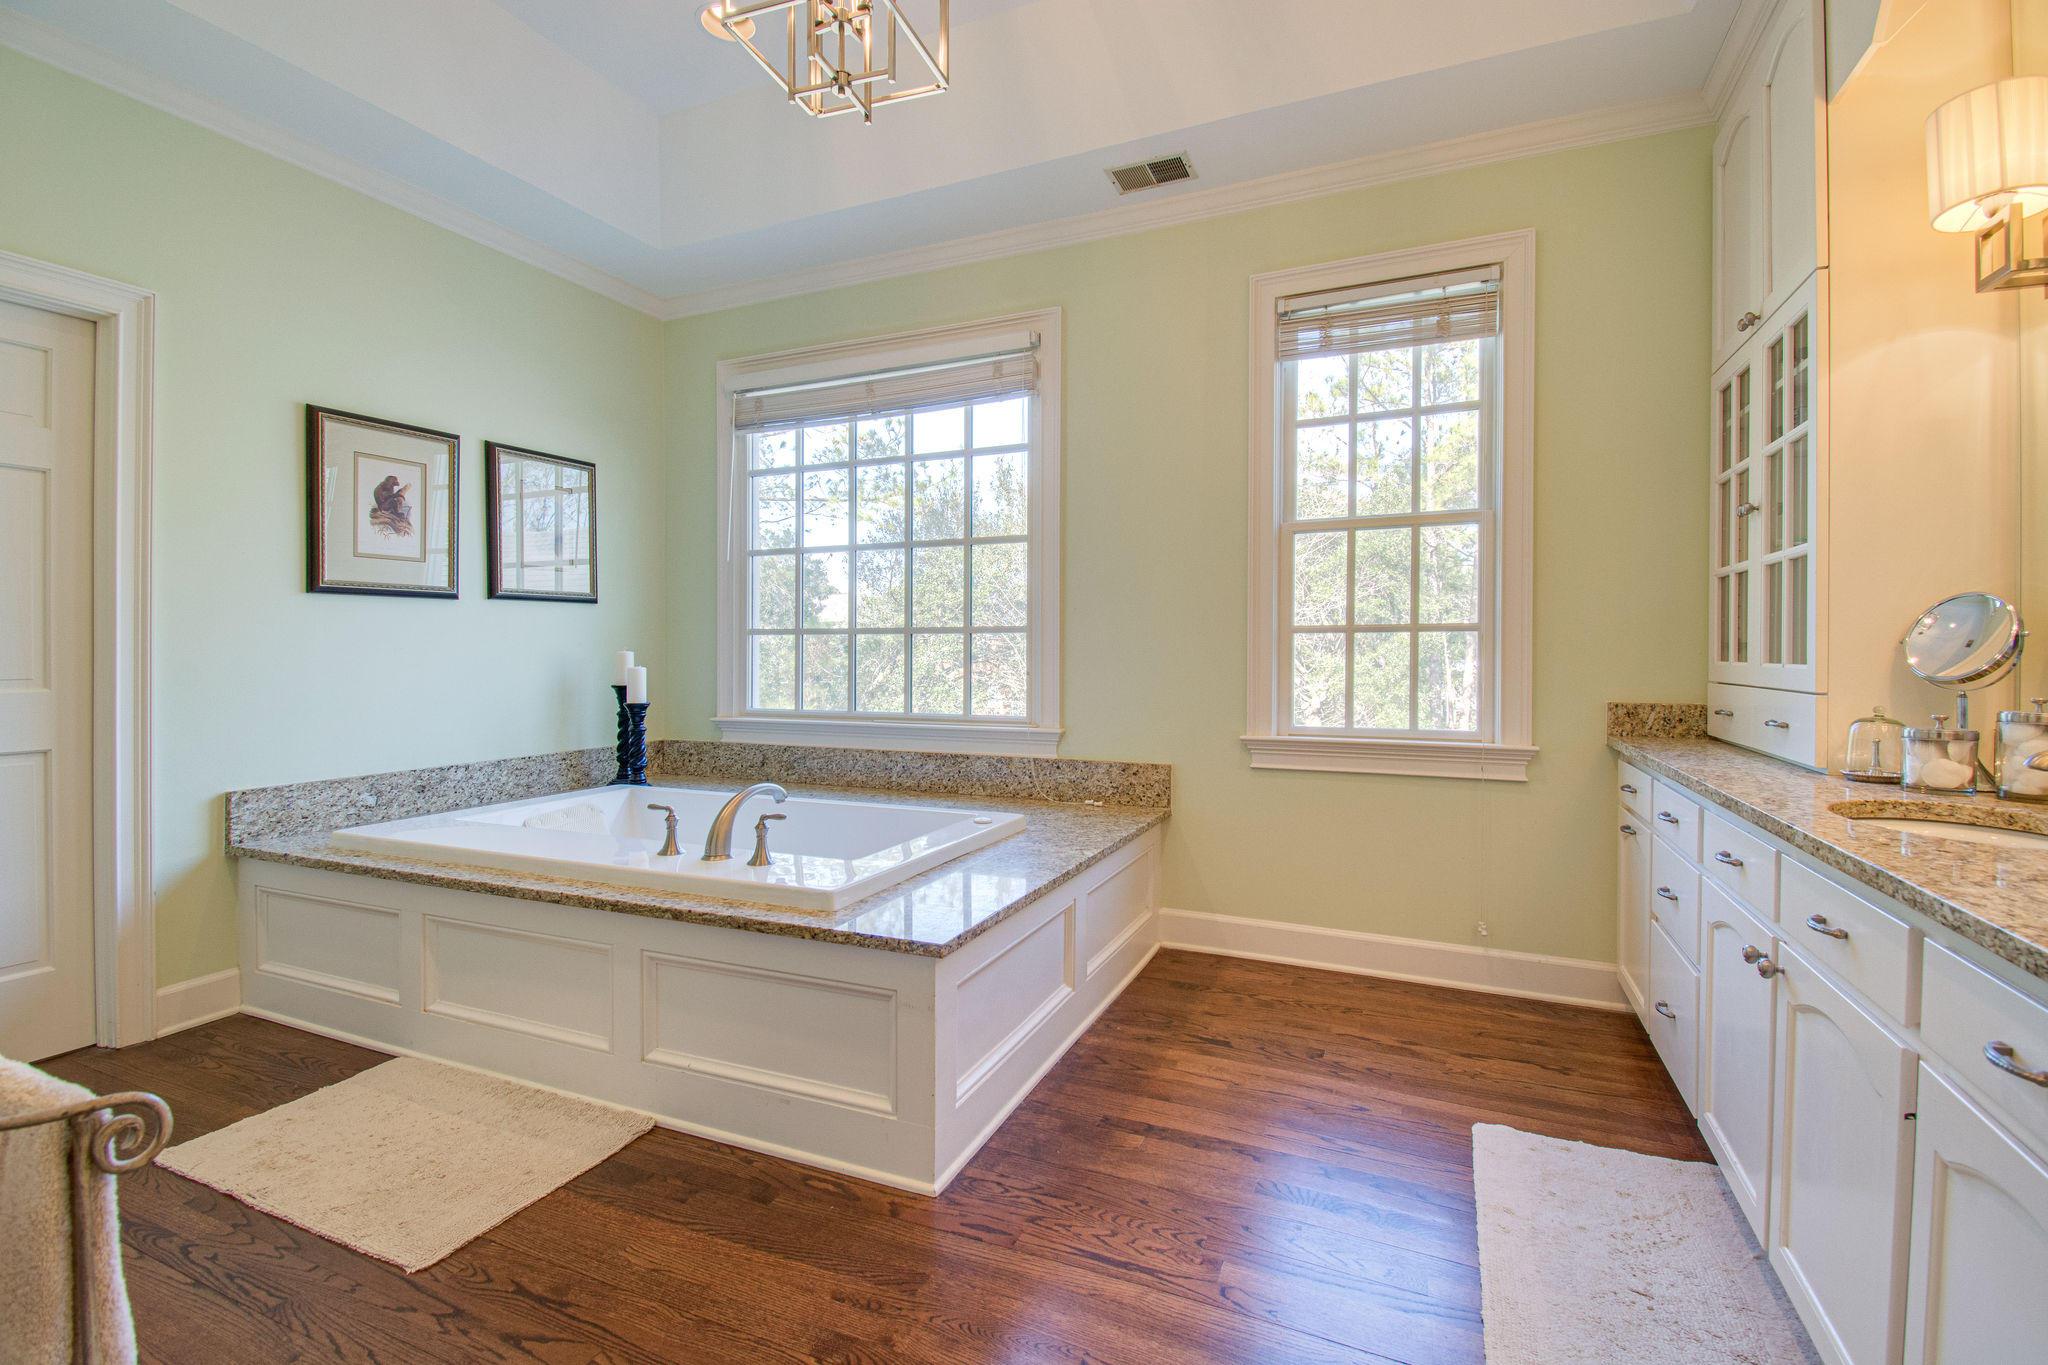 Hobcaw Creek Plantation Homes For Sale - 430 Channel Creek Court, Mount Pleasant, SC - 8